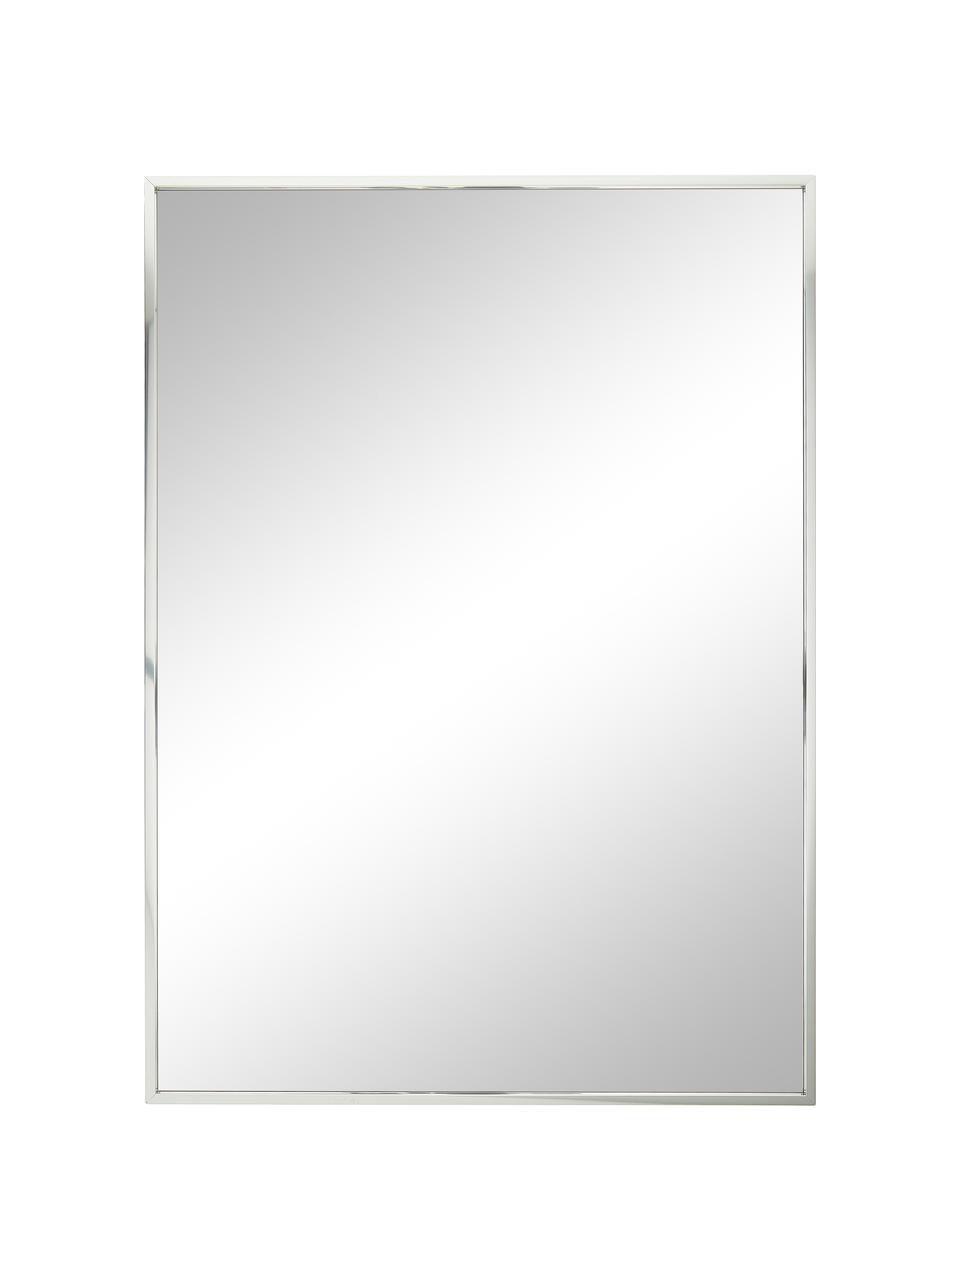 Eckiger Wandspiegel Alpha mit Silberrahmen, Rahmen: Aluminium, Spiegelfläche: Spiegelglas, Aluminium, 50 x 70 cm